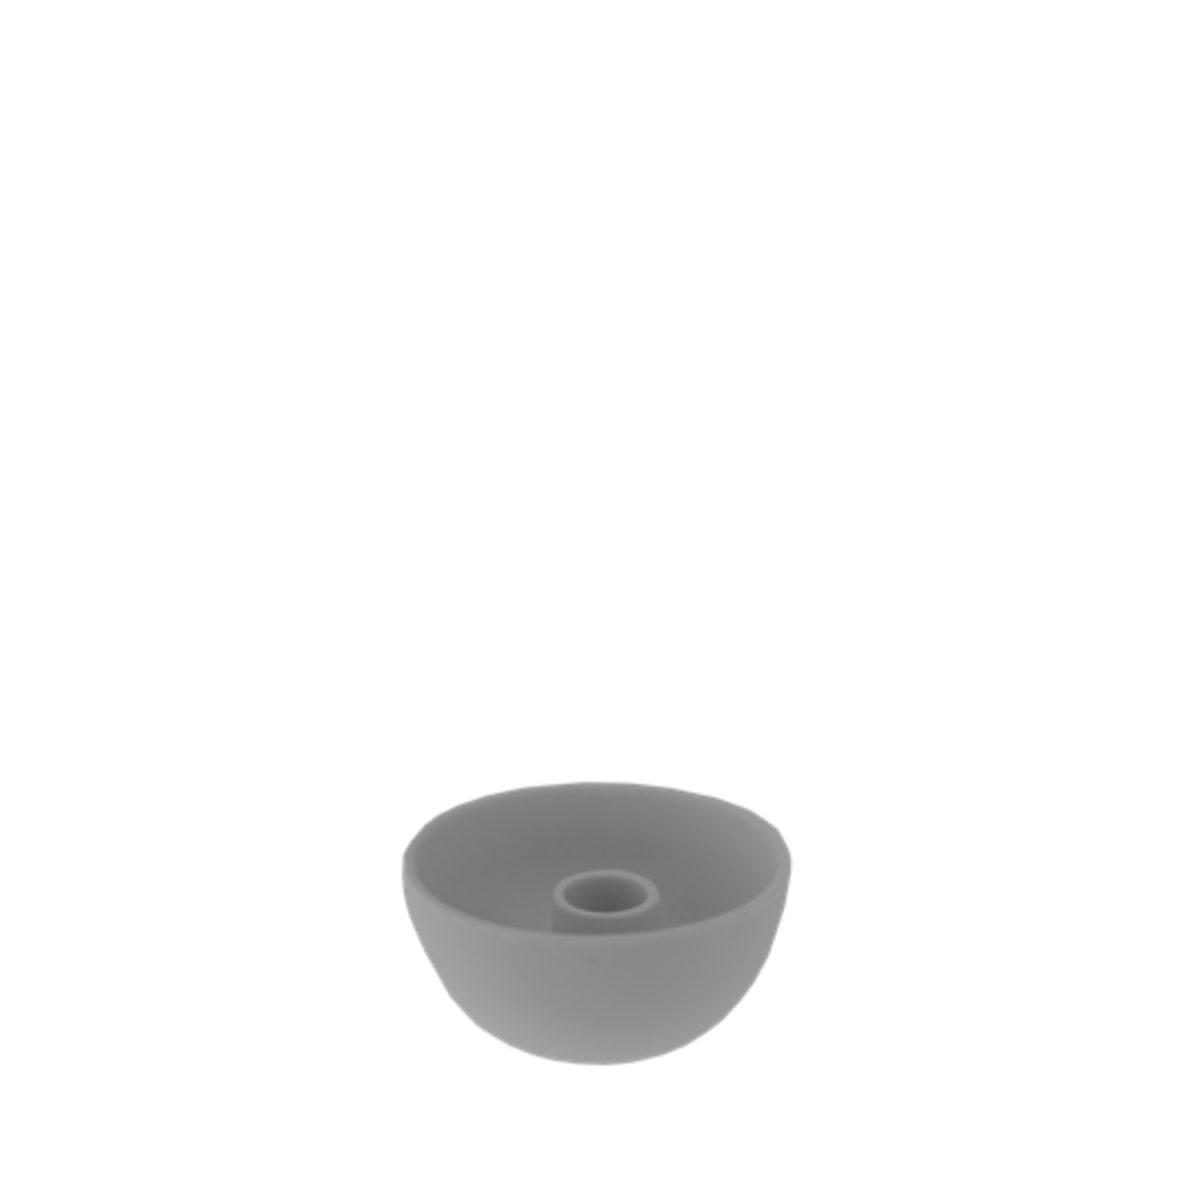 Nützlichdekoration - Storefactory LIDATORP Kerzenhalter hellgrau S 10 cm - Onlineshop Tante Emmer